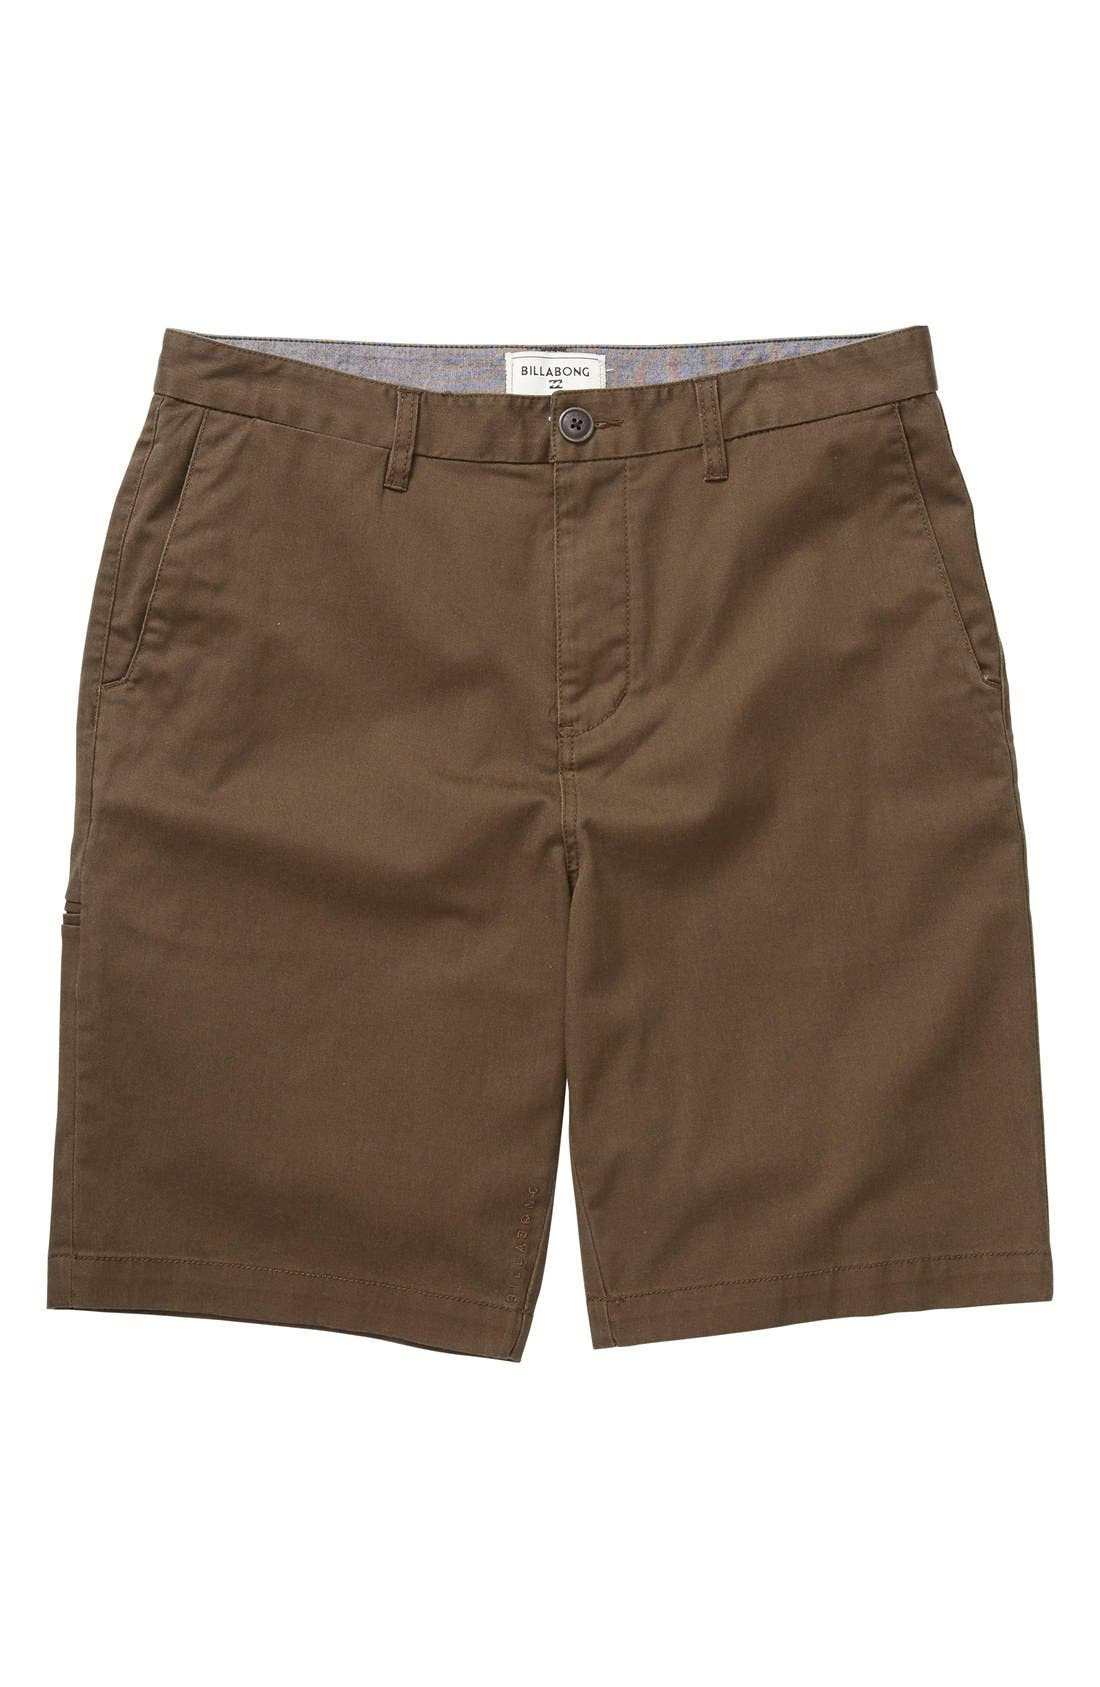 Alternate Image 1 Selected - Billabong 'Carter' Cotton Twill Shorts (Toddler Boys & Little Boys)